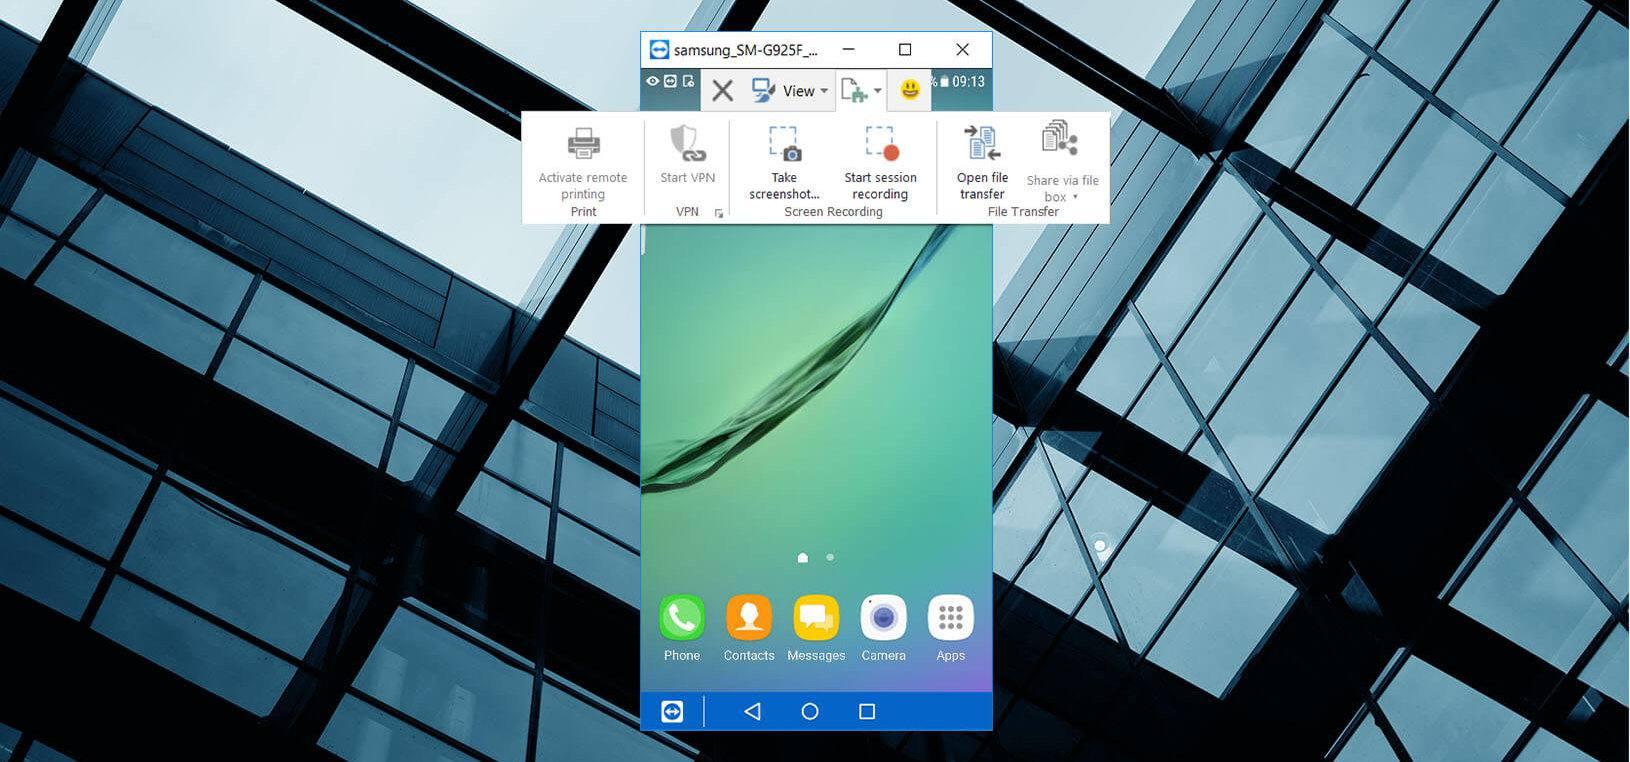 Viewing a smartphone screen on Windows via TeamViewer.